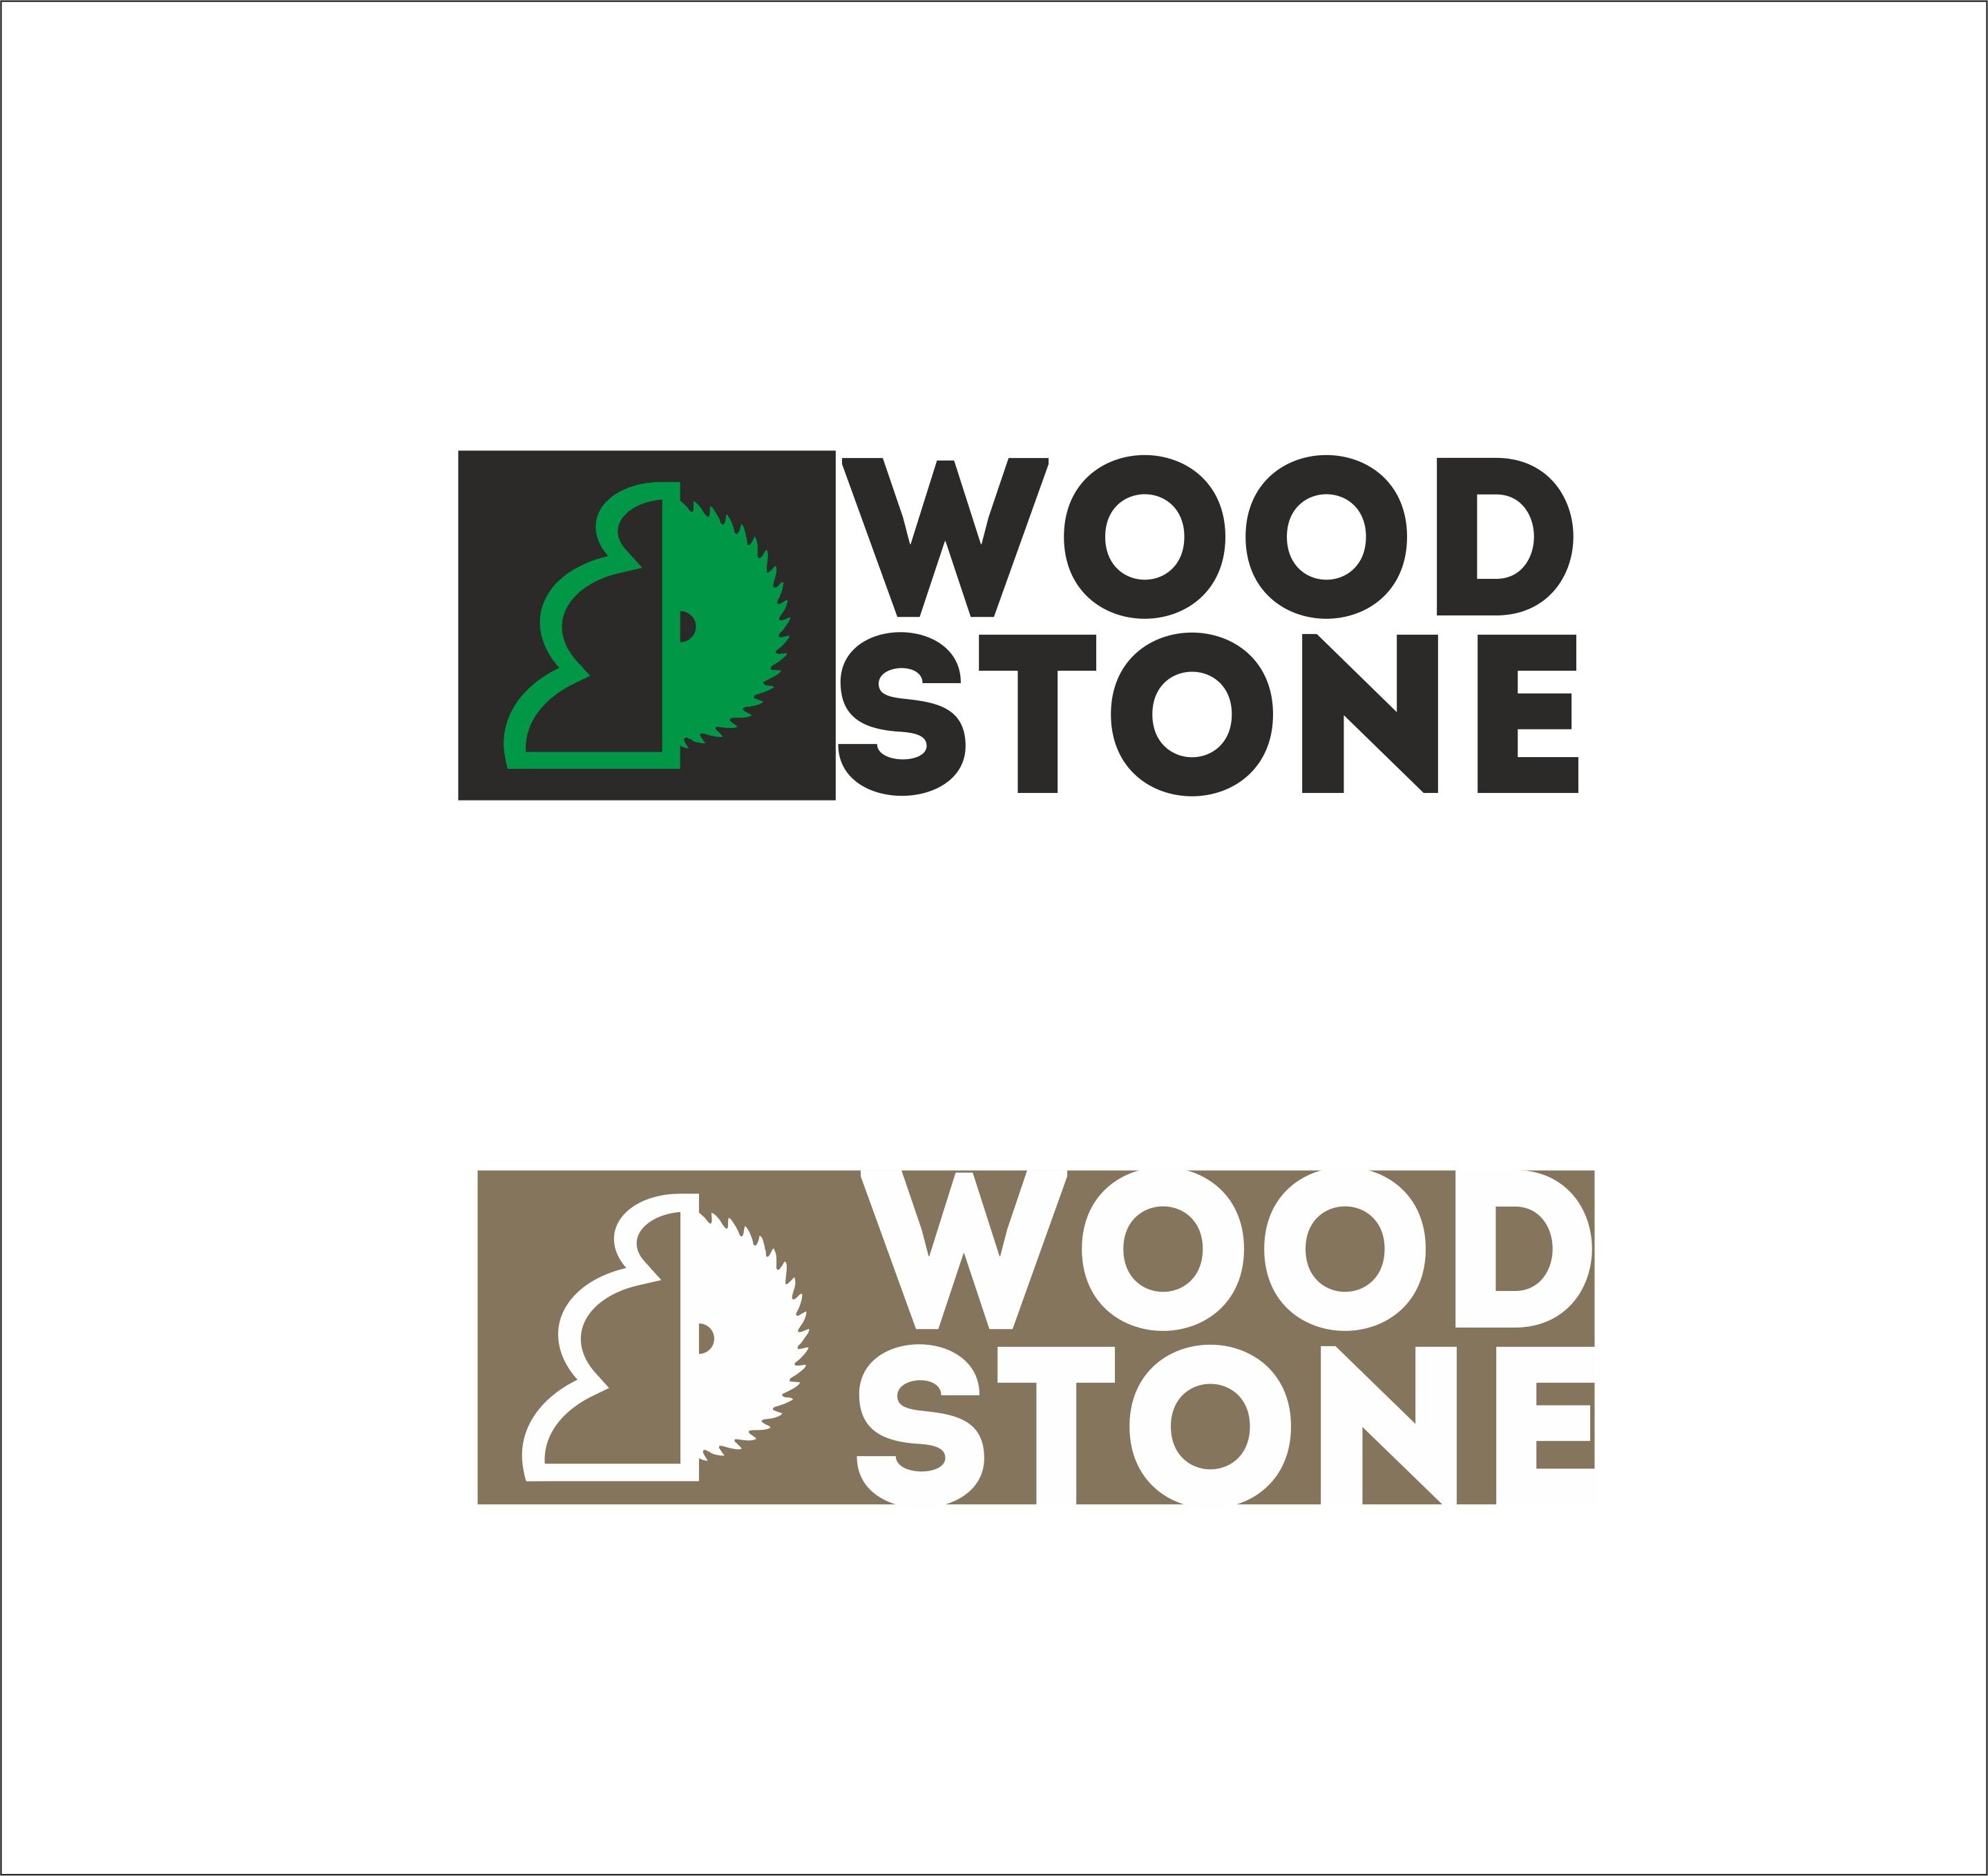 Логотип и Фирменный стиль фото f_7885497c5cb716b1.jpg